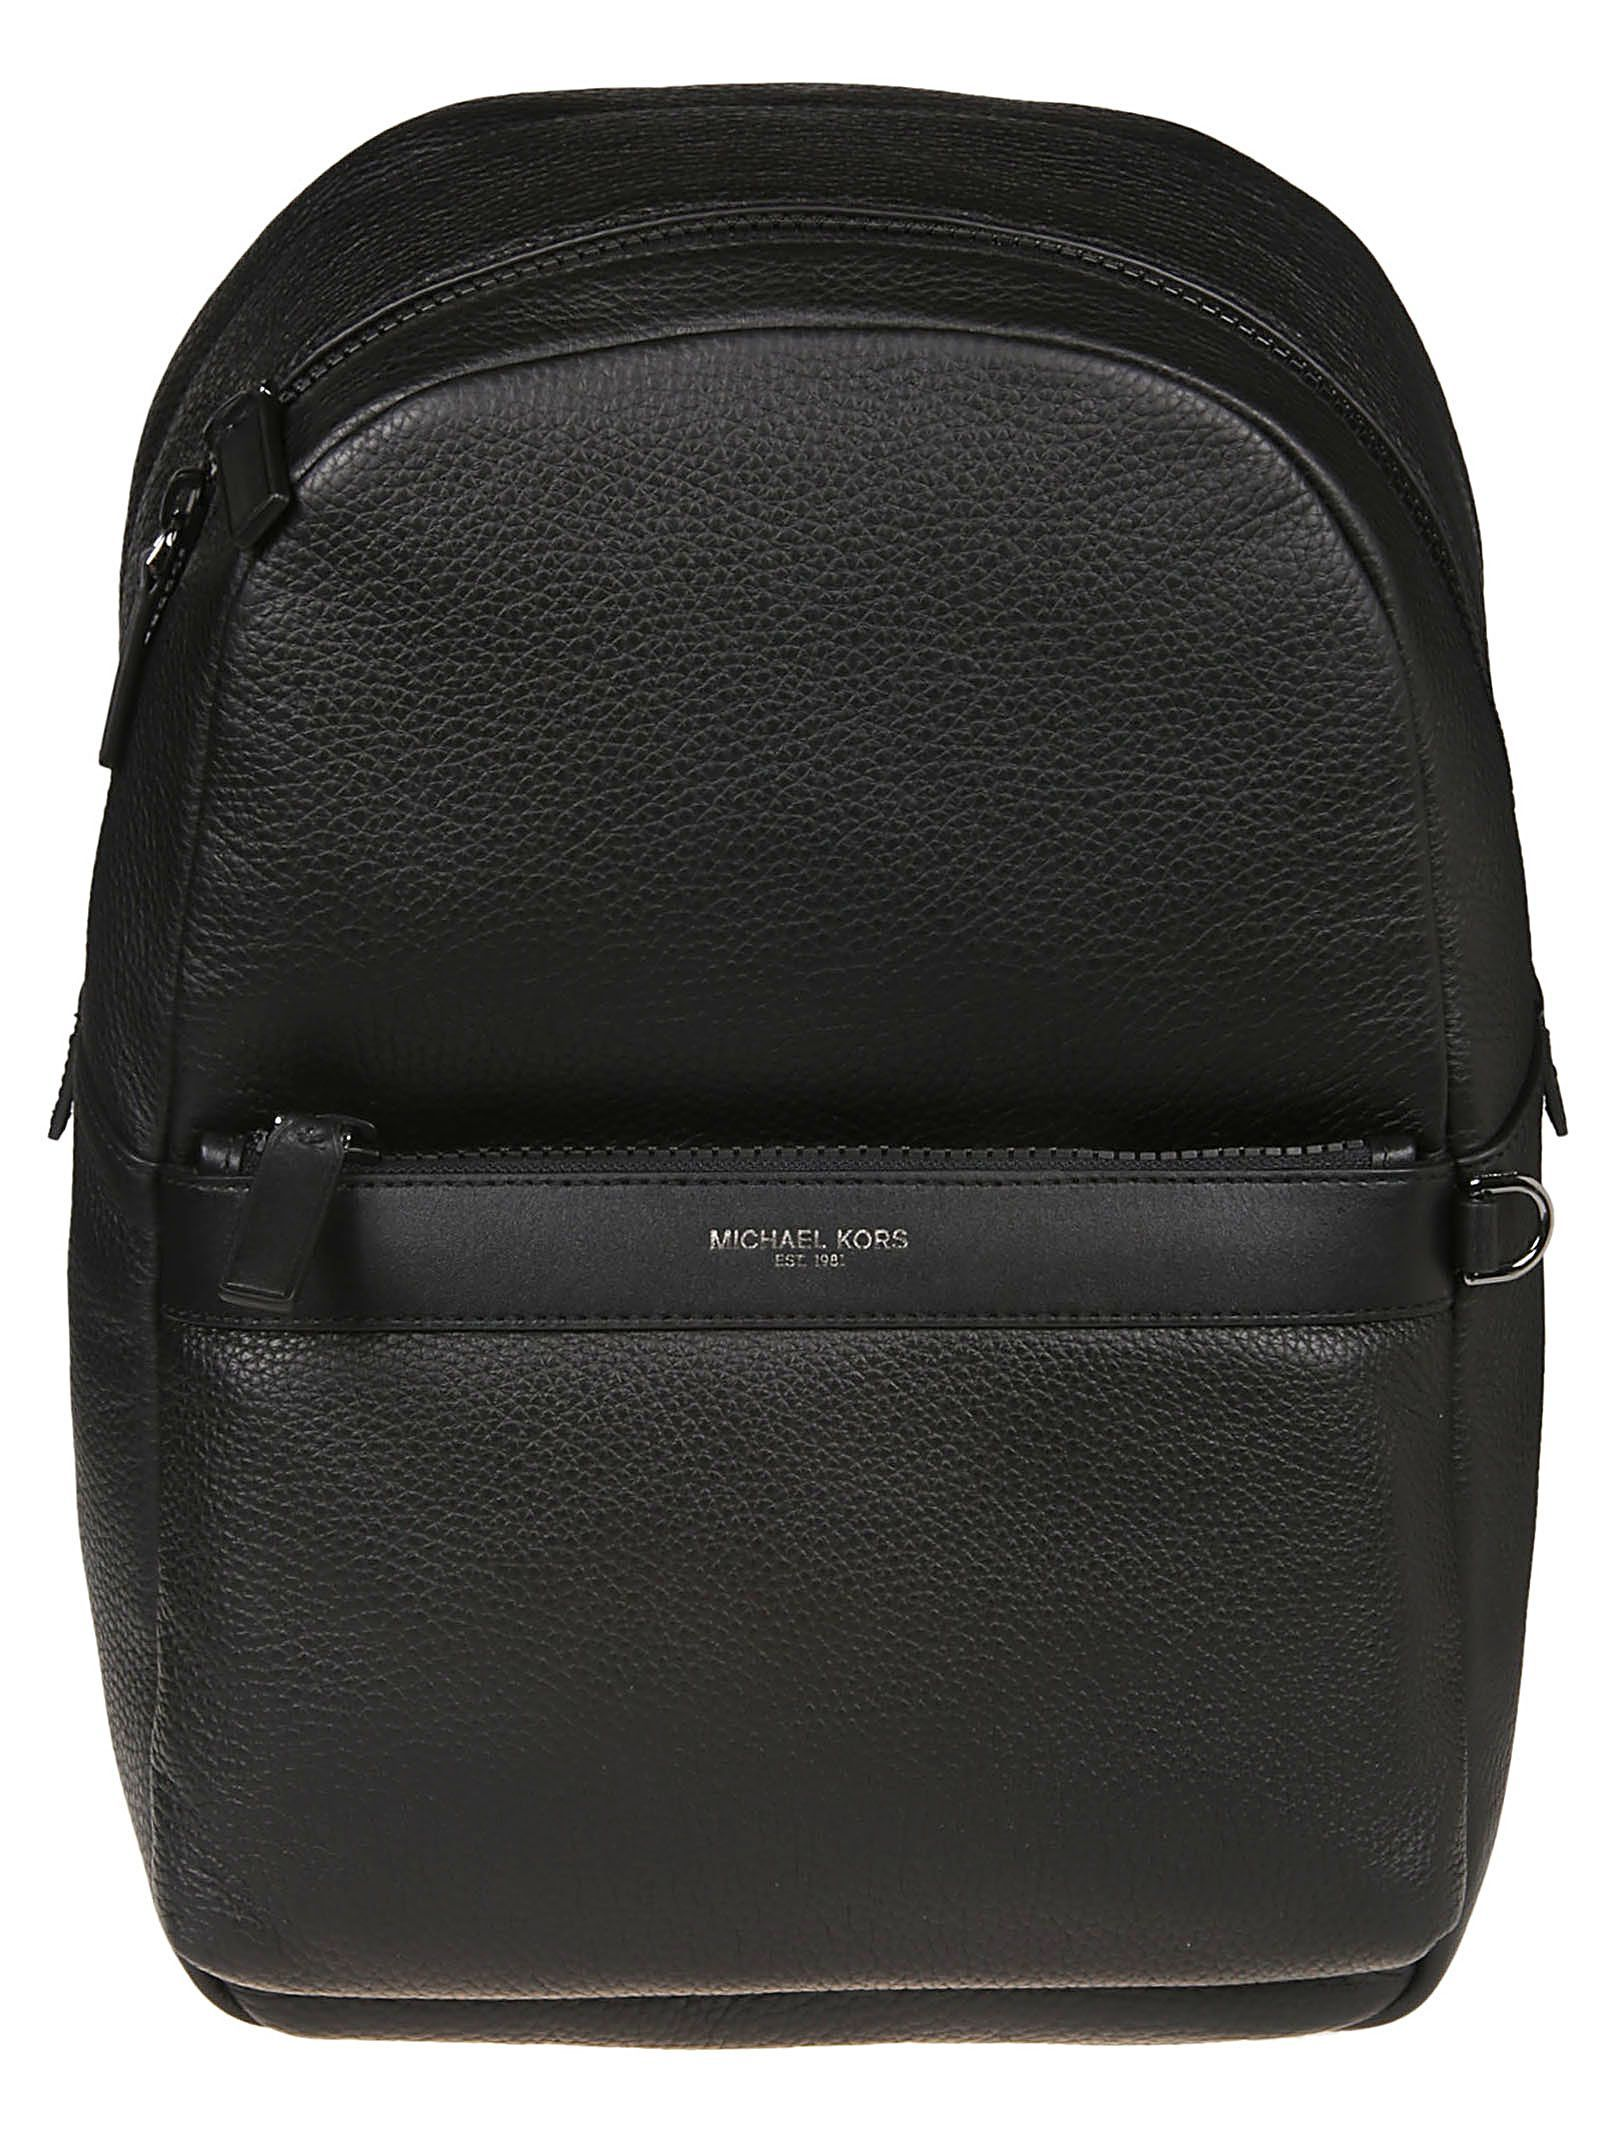 d0e6a3c8099f46 MICHAEL KORS GREYSON BACKPACK. #michaelkors #bags #backpacks ...